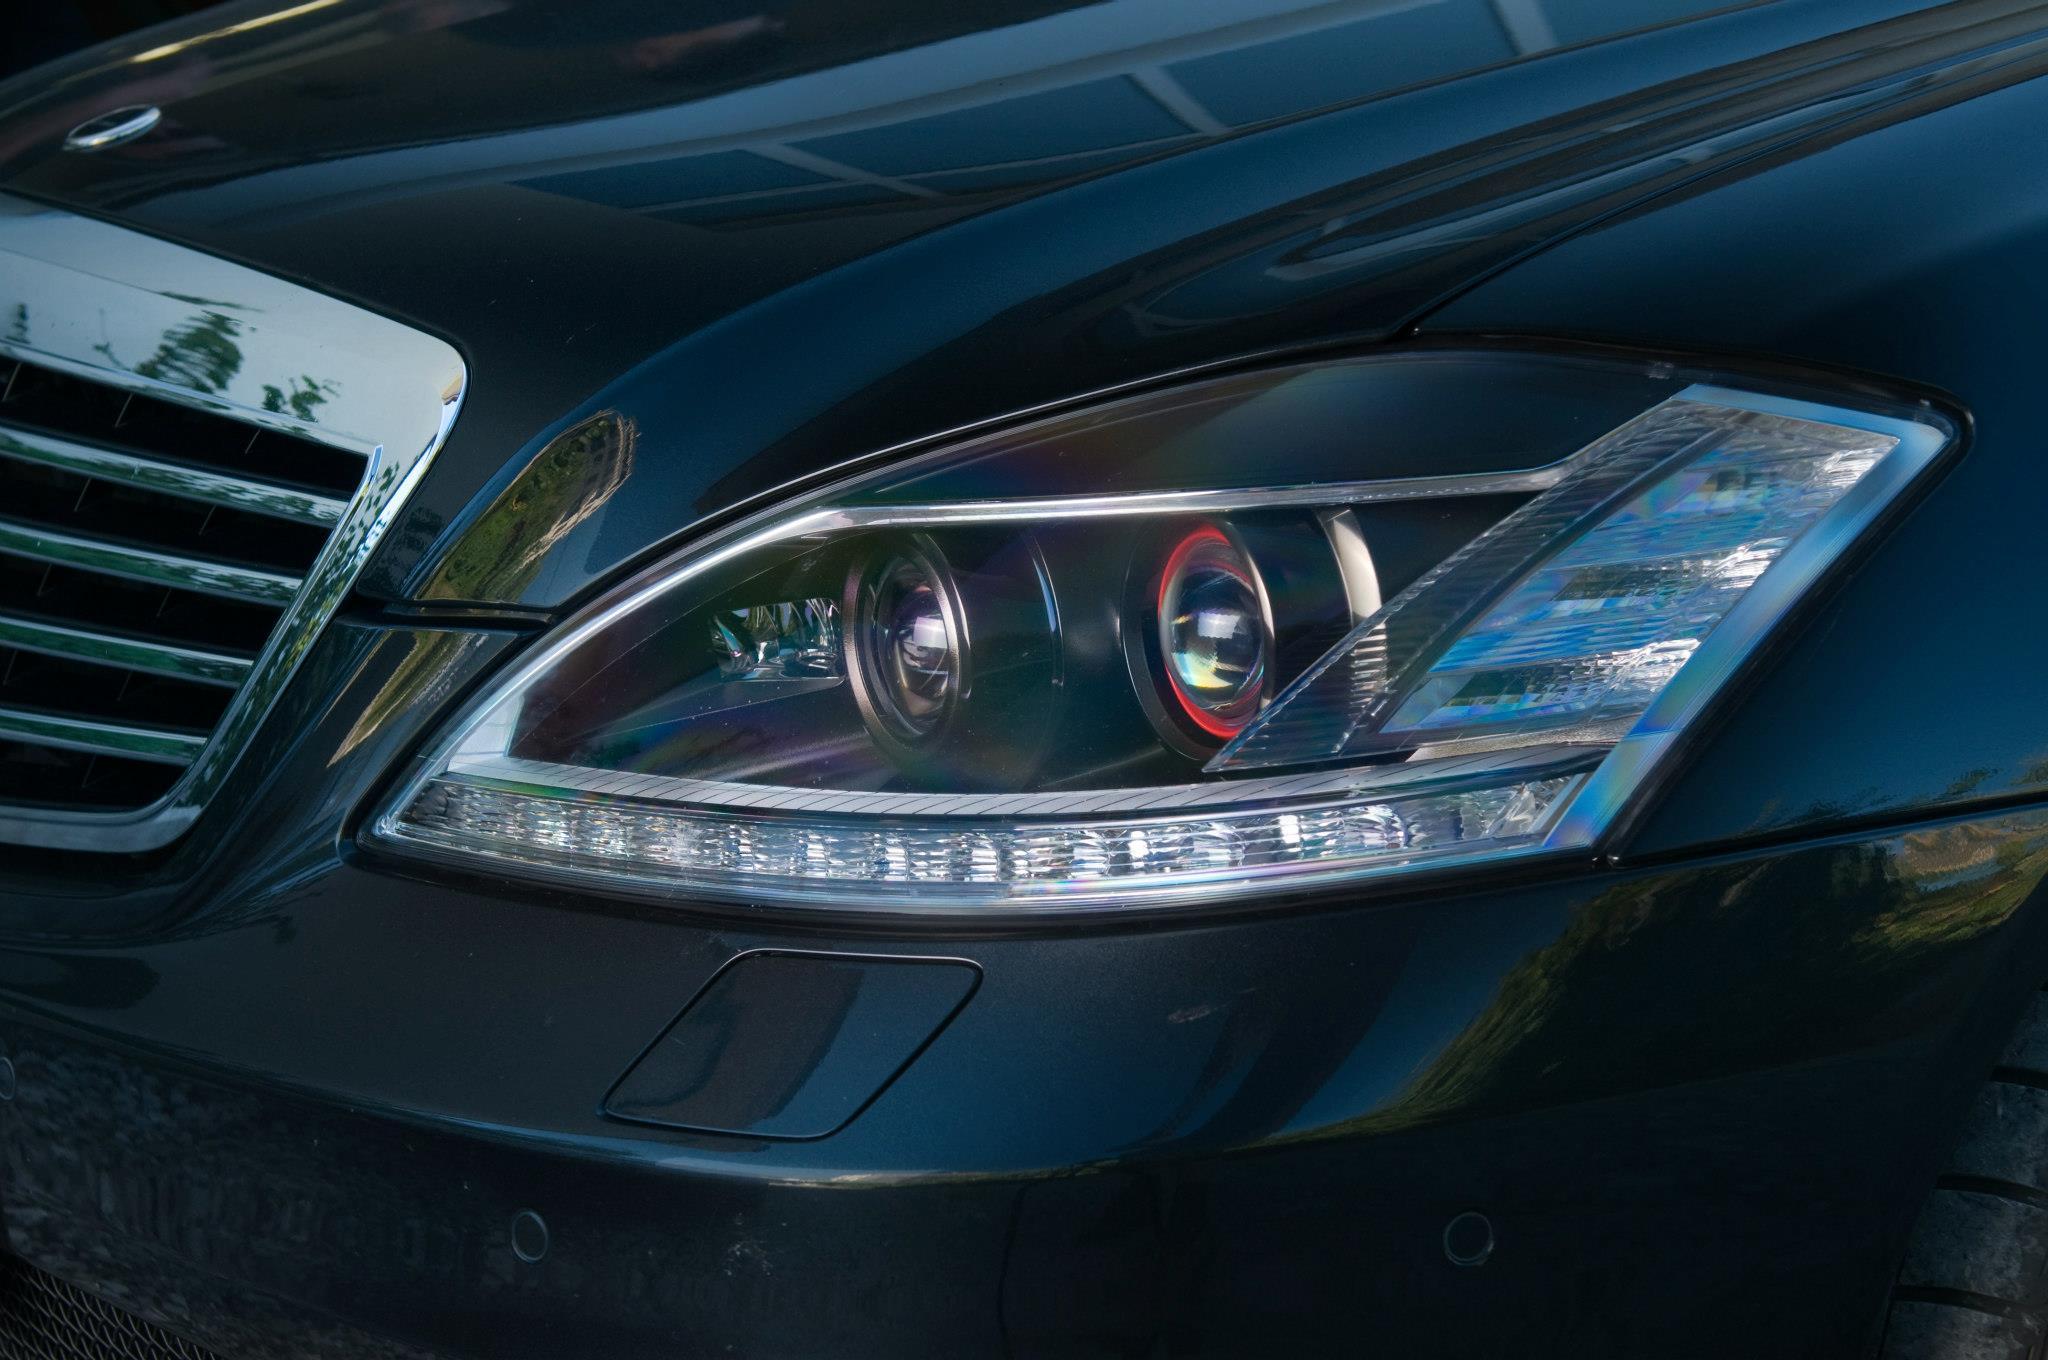 Vilner Completes Carlsson Mercedes Benz S500 2000 Fuse Box Home 8 Of